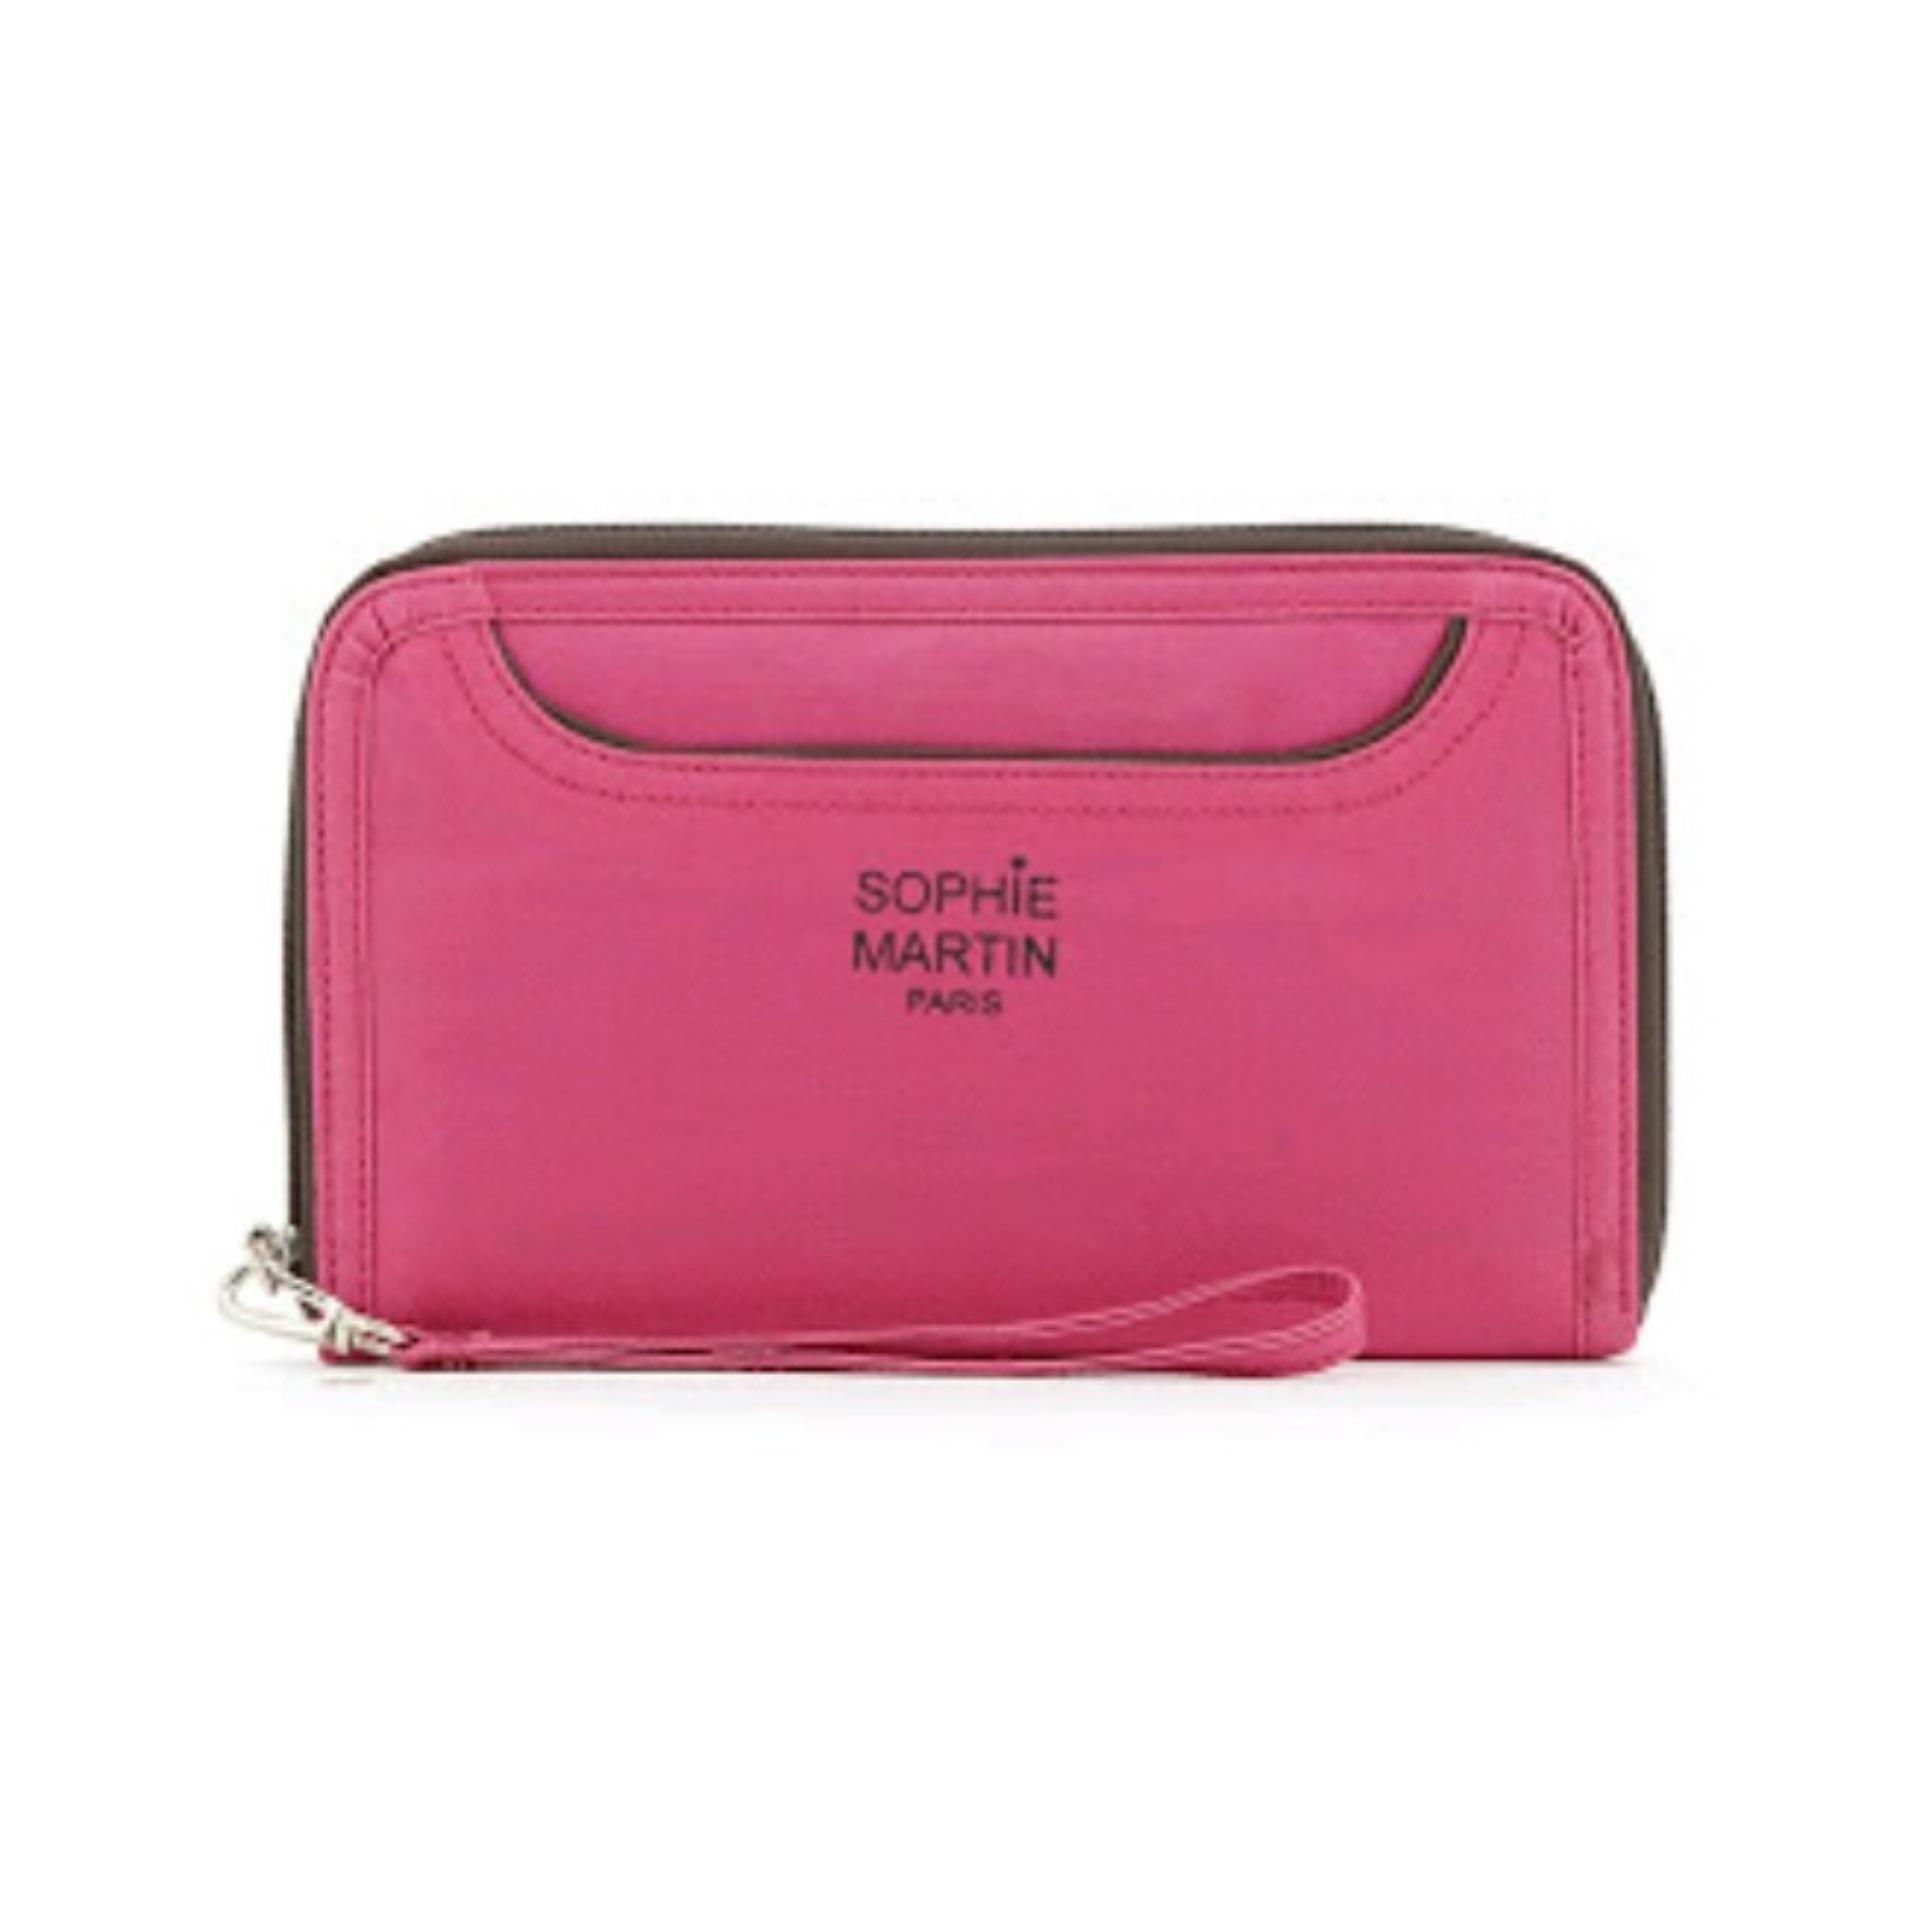 Sophie Paris Dompet Wanita Andari Wallet W1371M2 Maroon Source DOMPET CHRYSANT . Source. ' Dompet